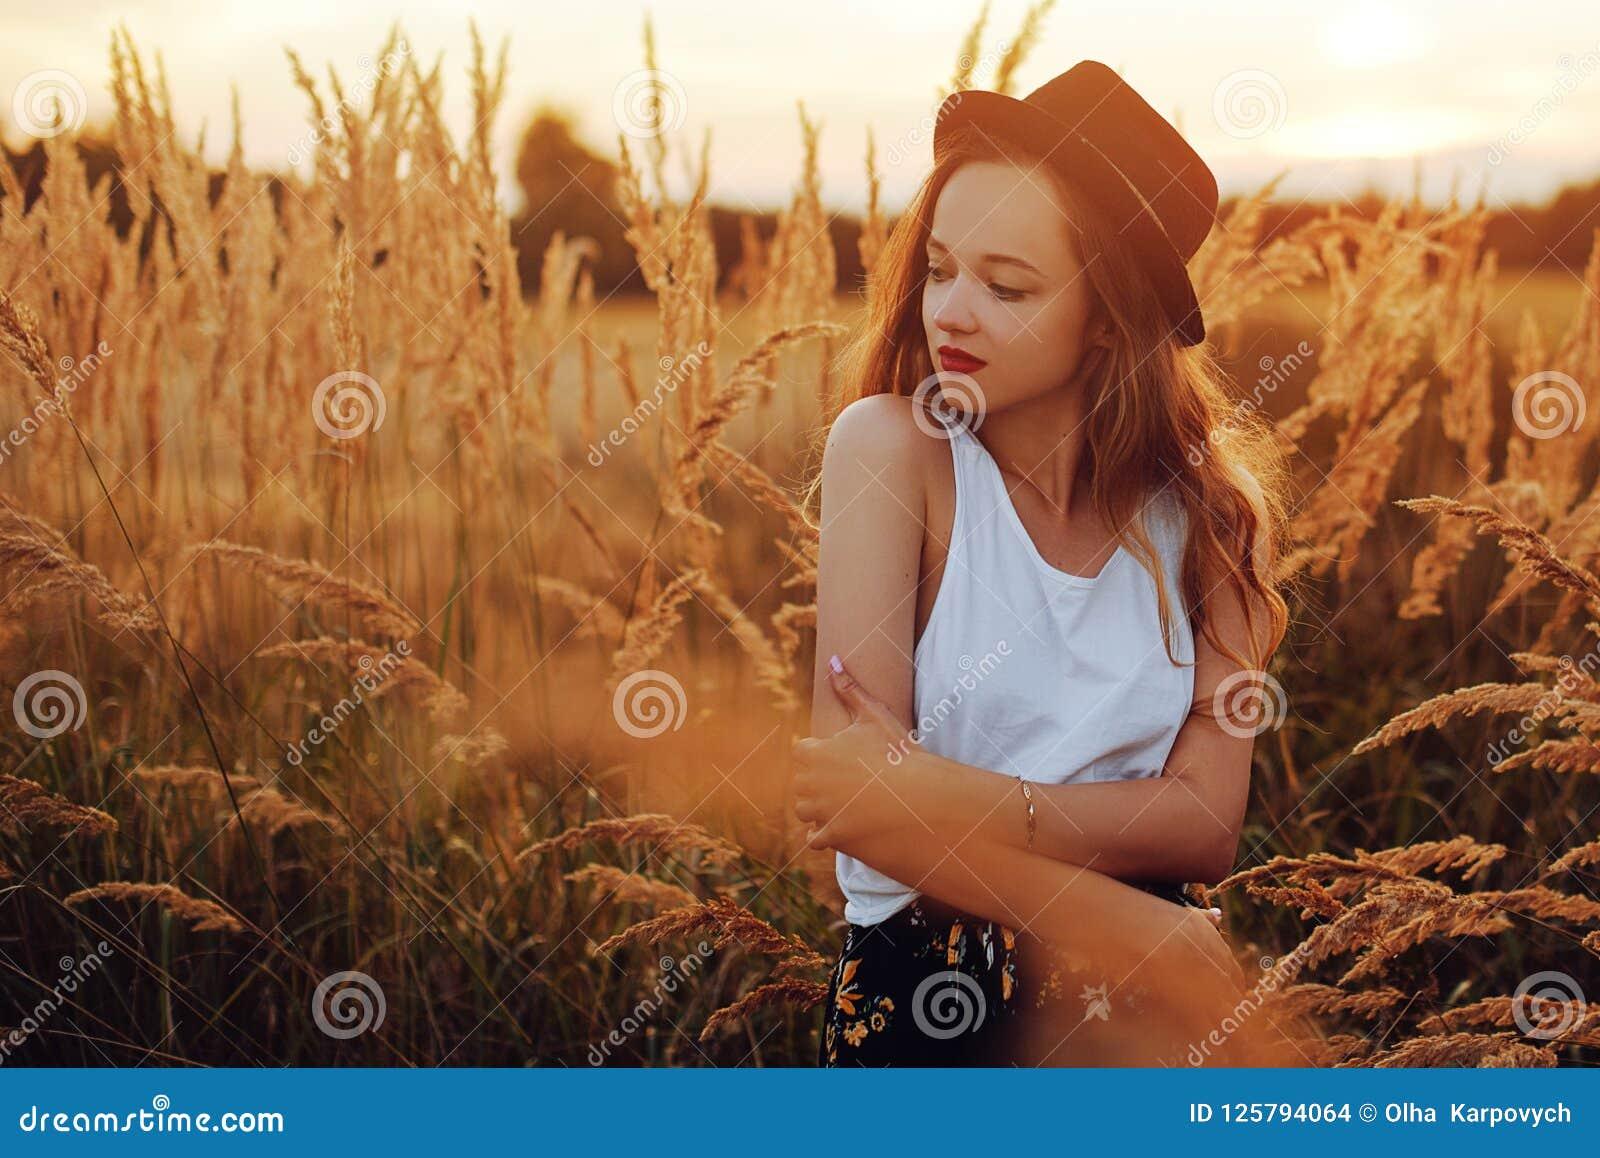 Beauty Girl Outdoors enjoying nature. Pretty Teenage Model in hat running on the Spring Field, Sun Light. Romantic